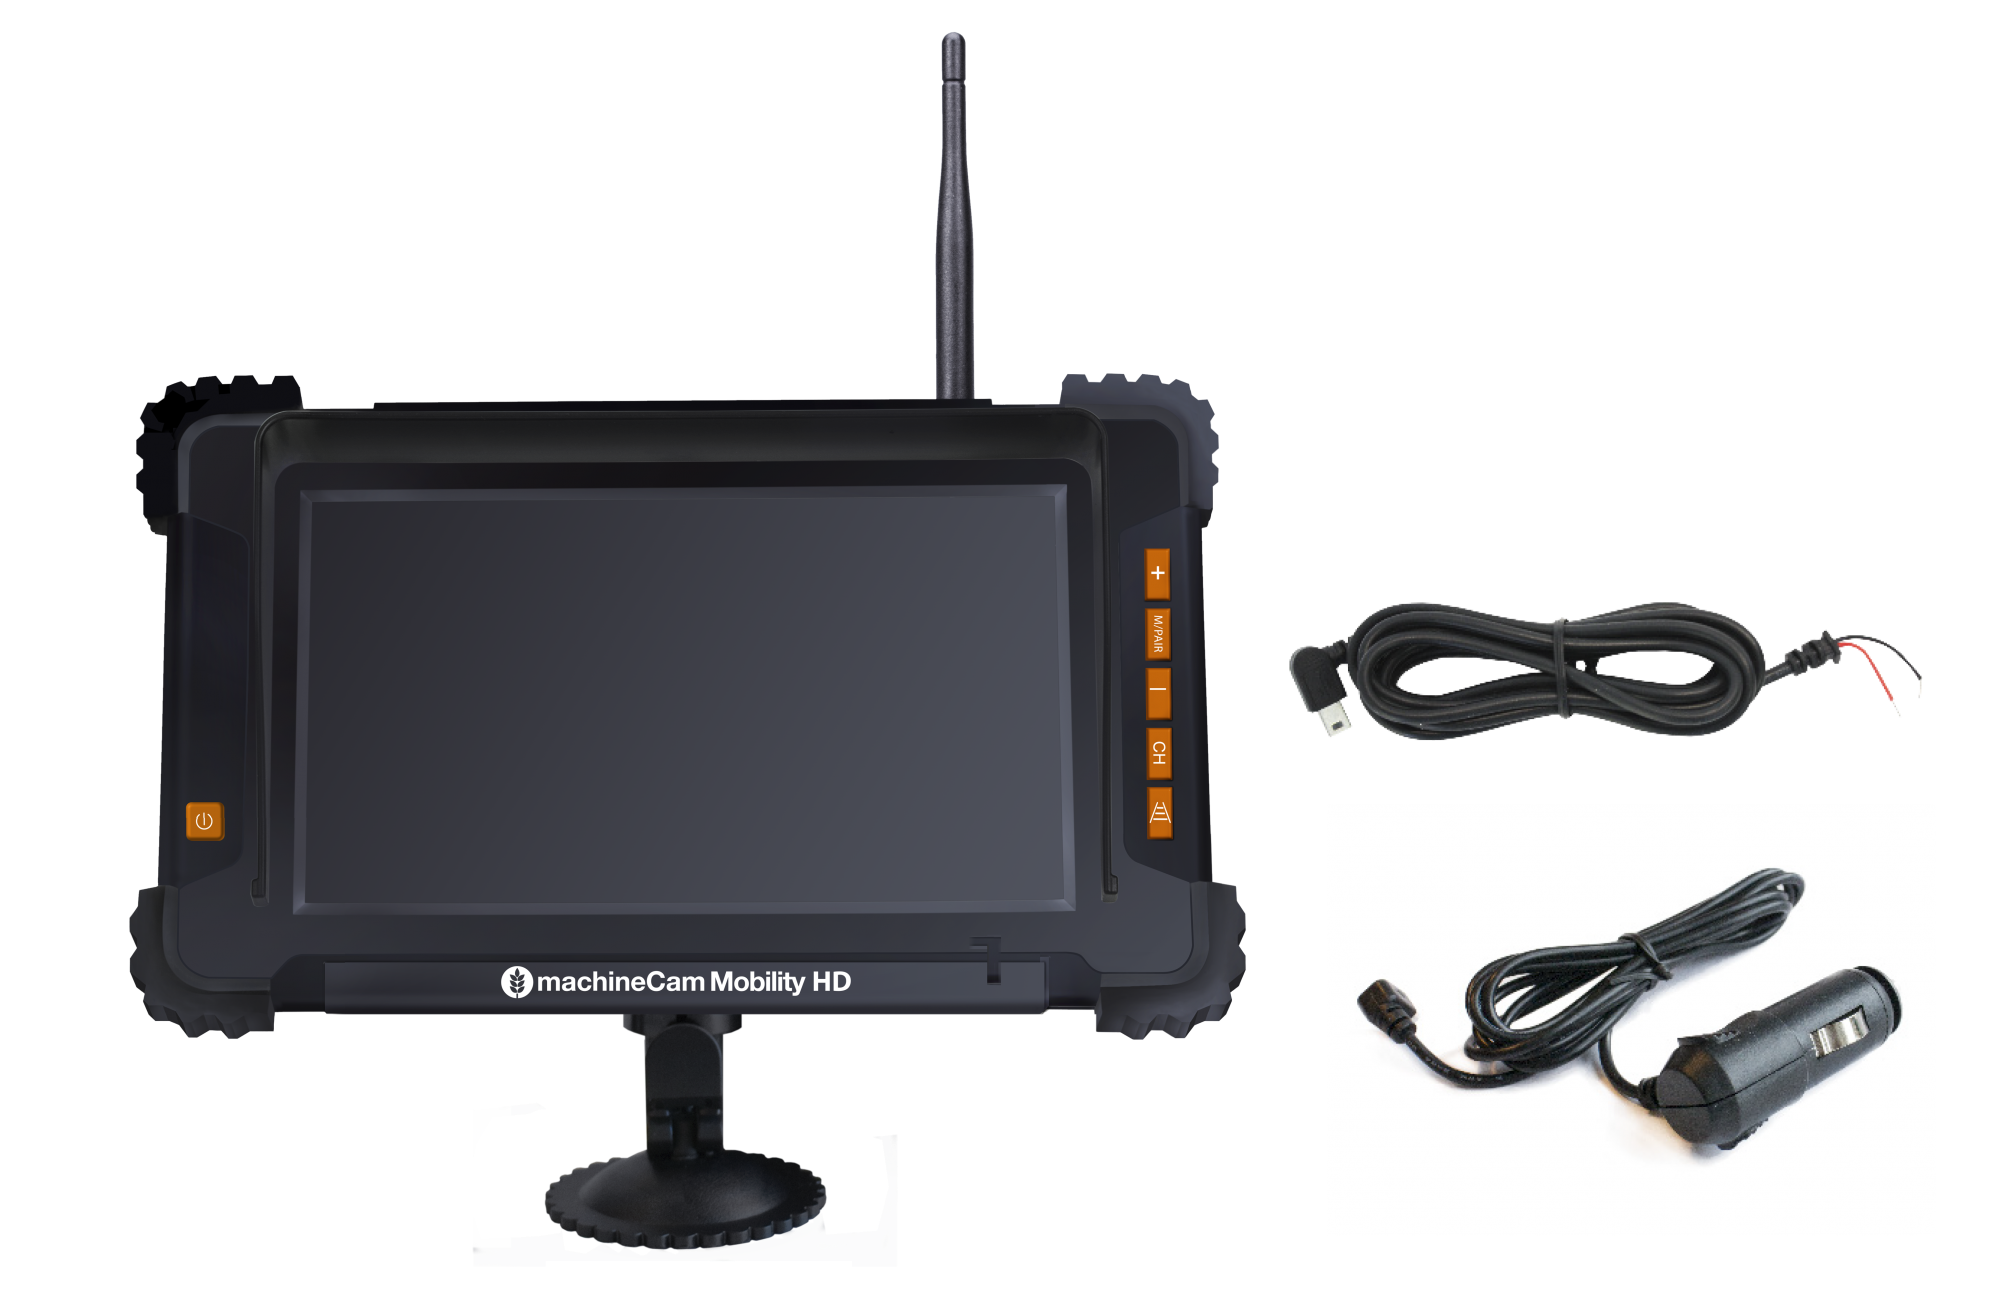 Moniteur caméra de recul MachineCam Mobility HD Luda